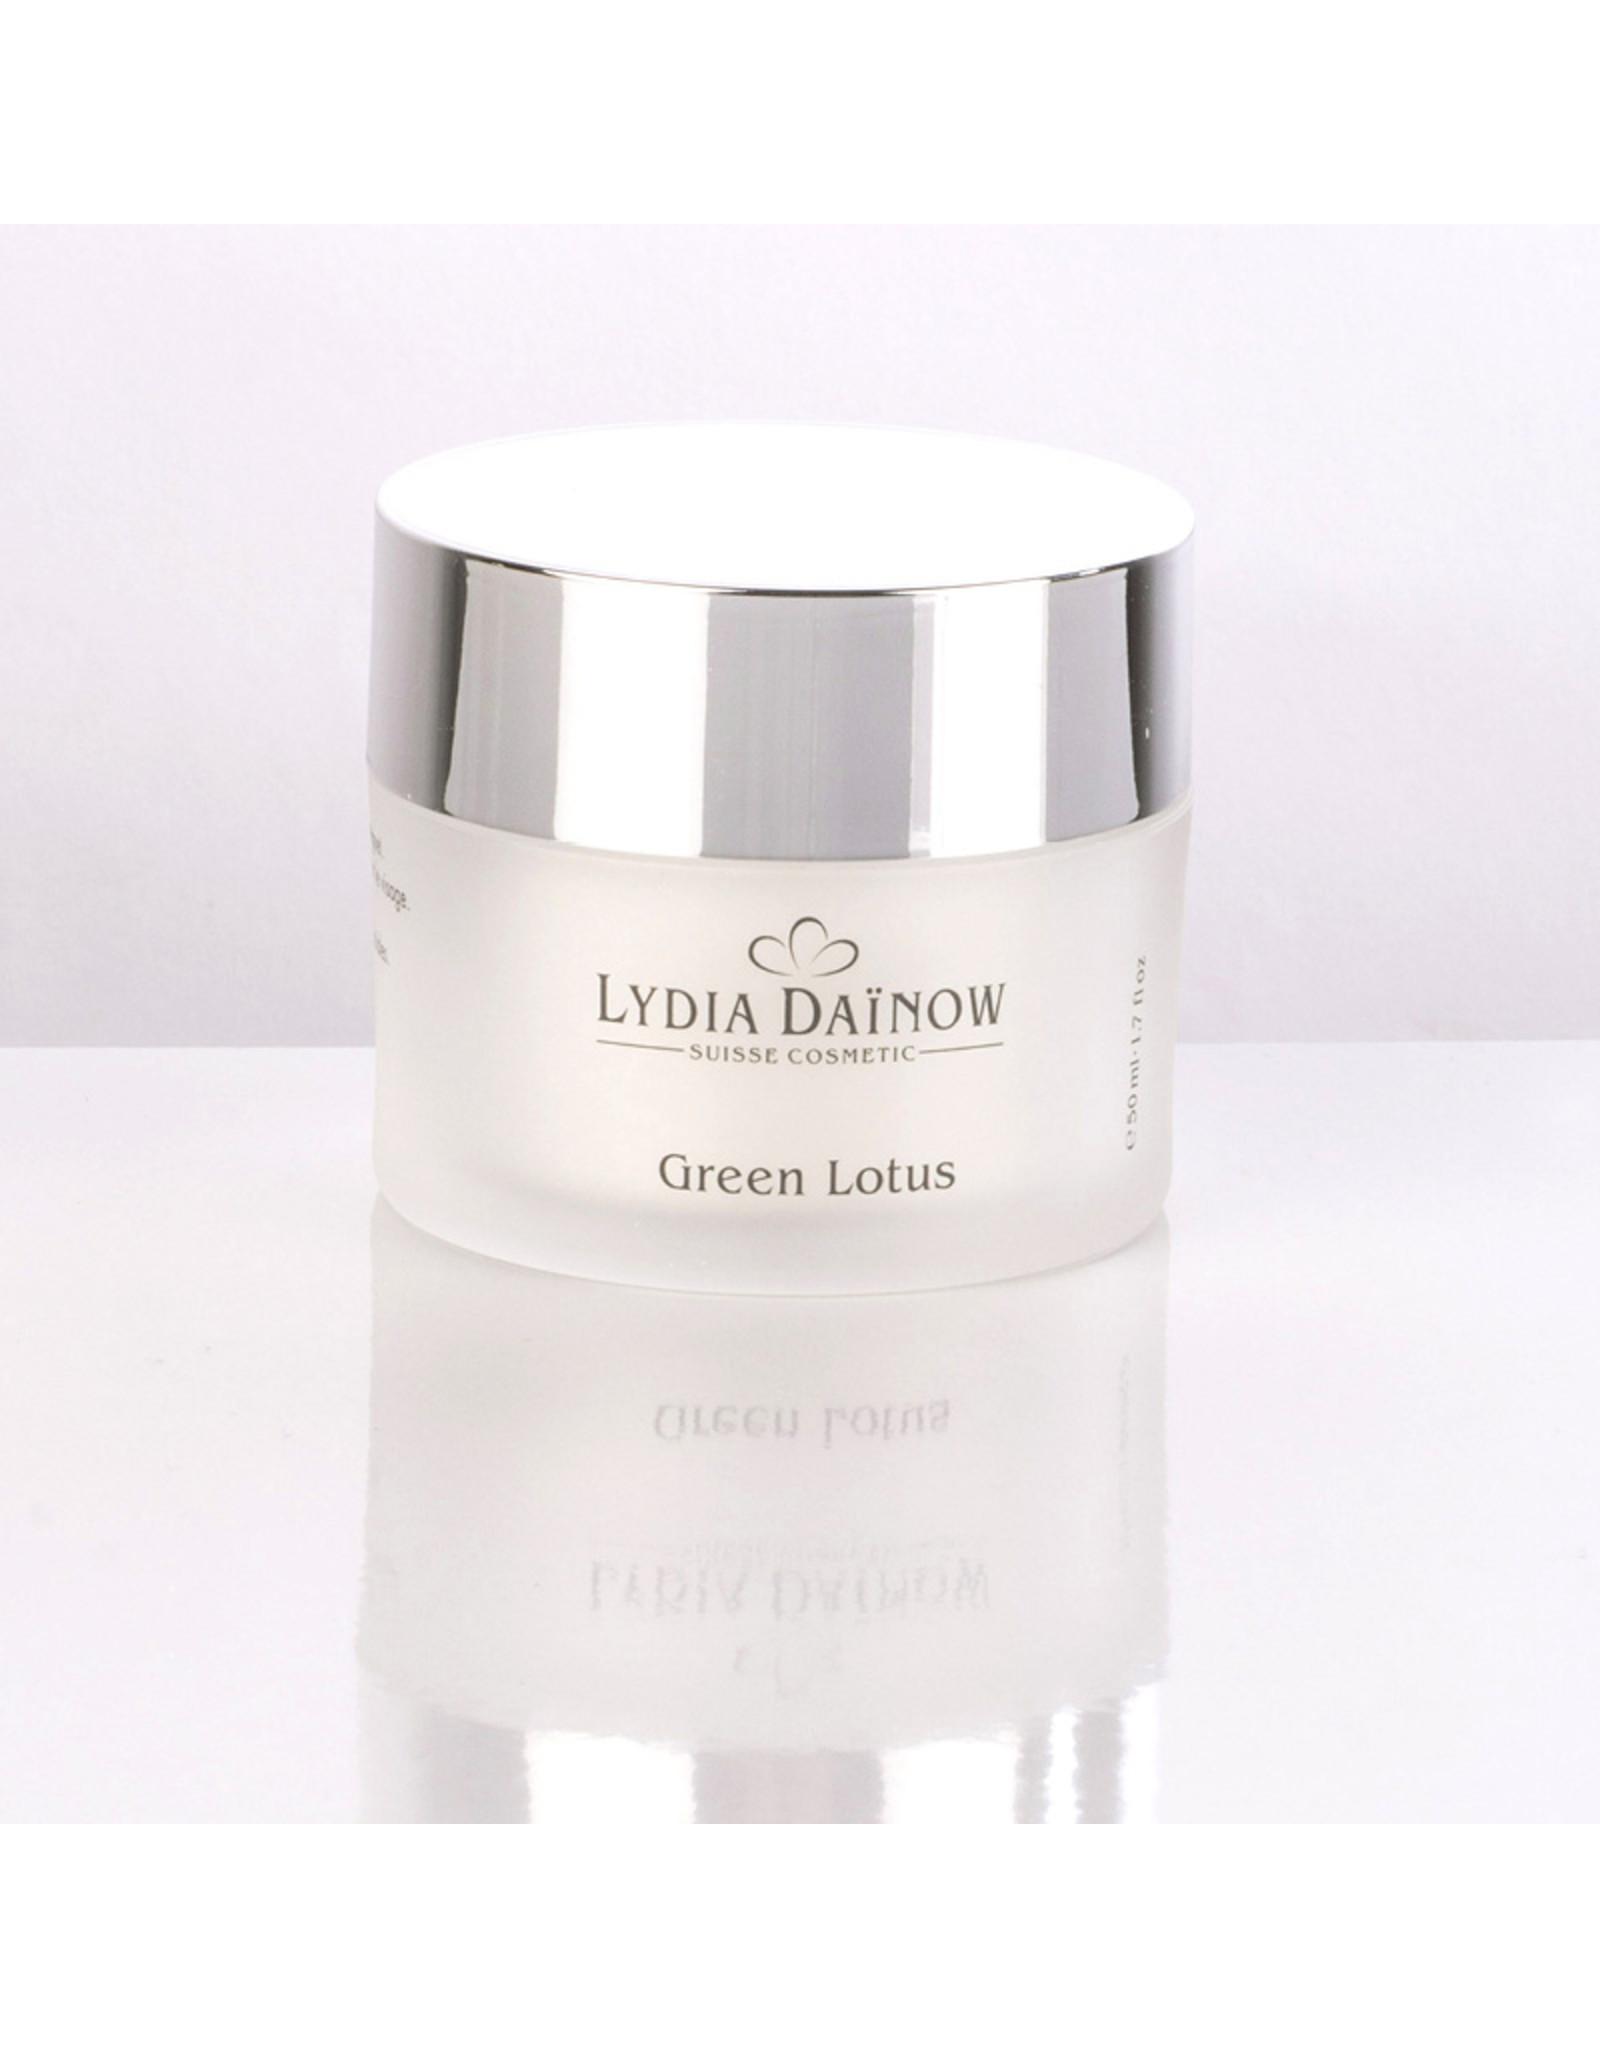 Lydïa Dainow Green Lotus - Protective cream